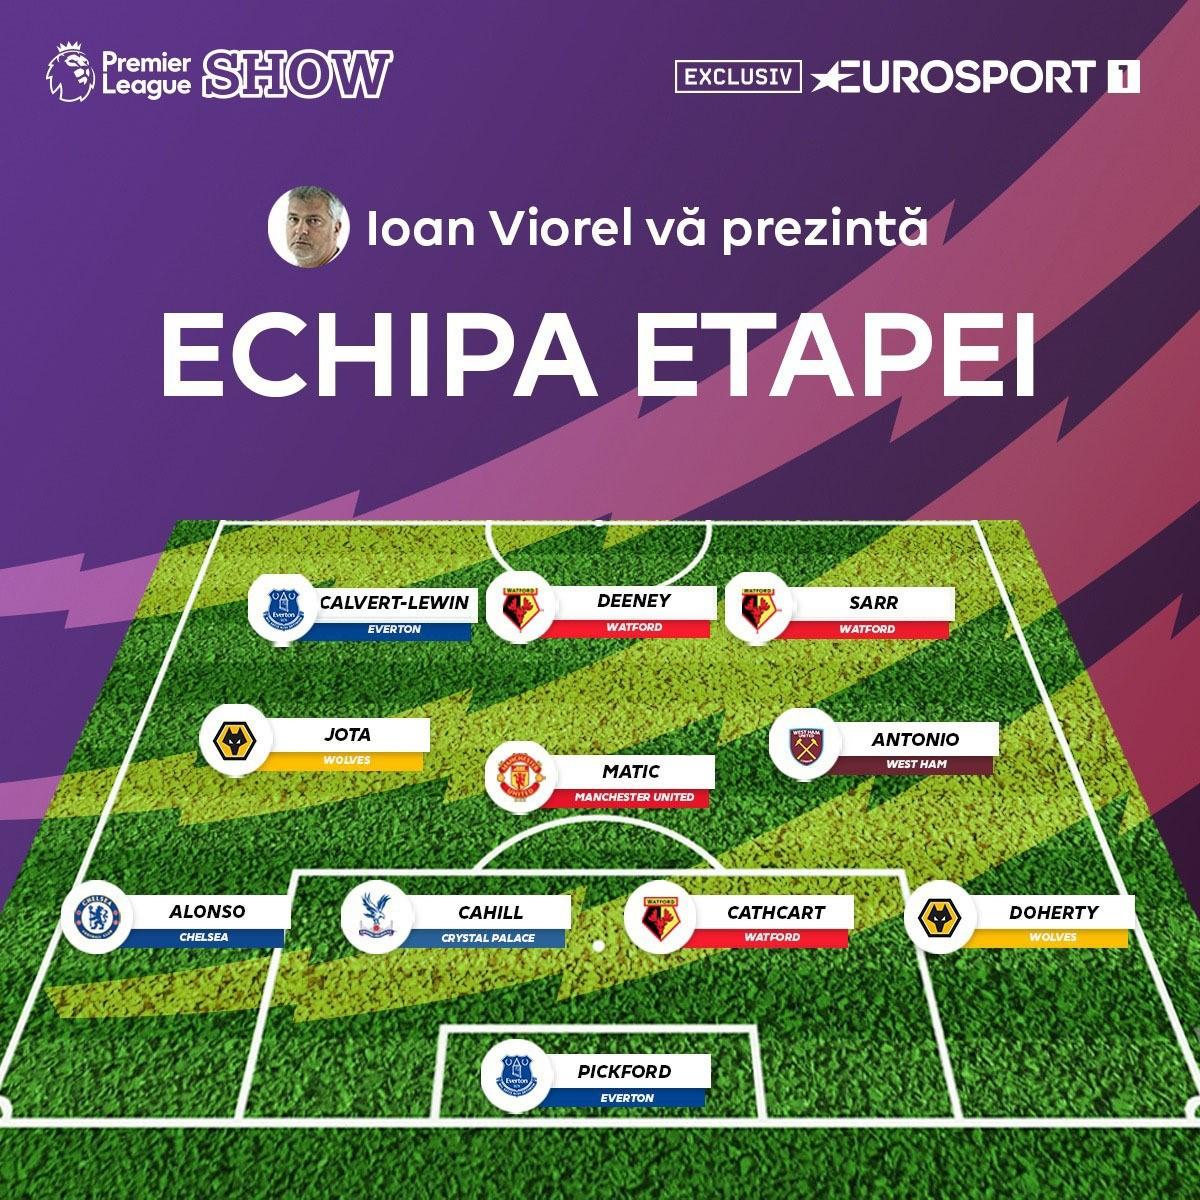 https://i.eurosport.com/2020/03/04/2788813.jpg